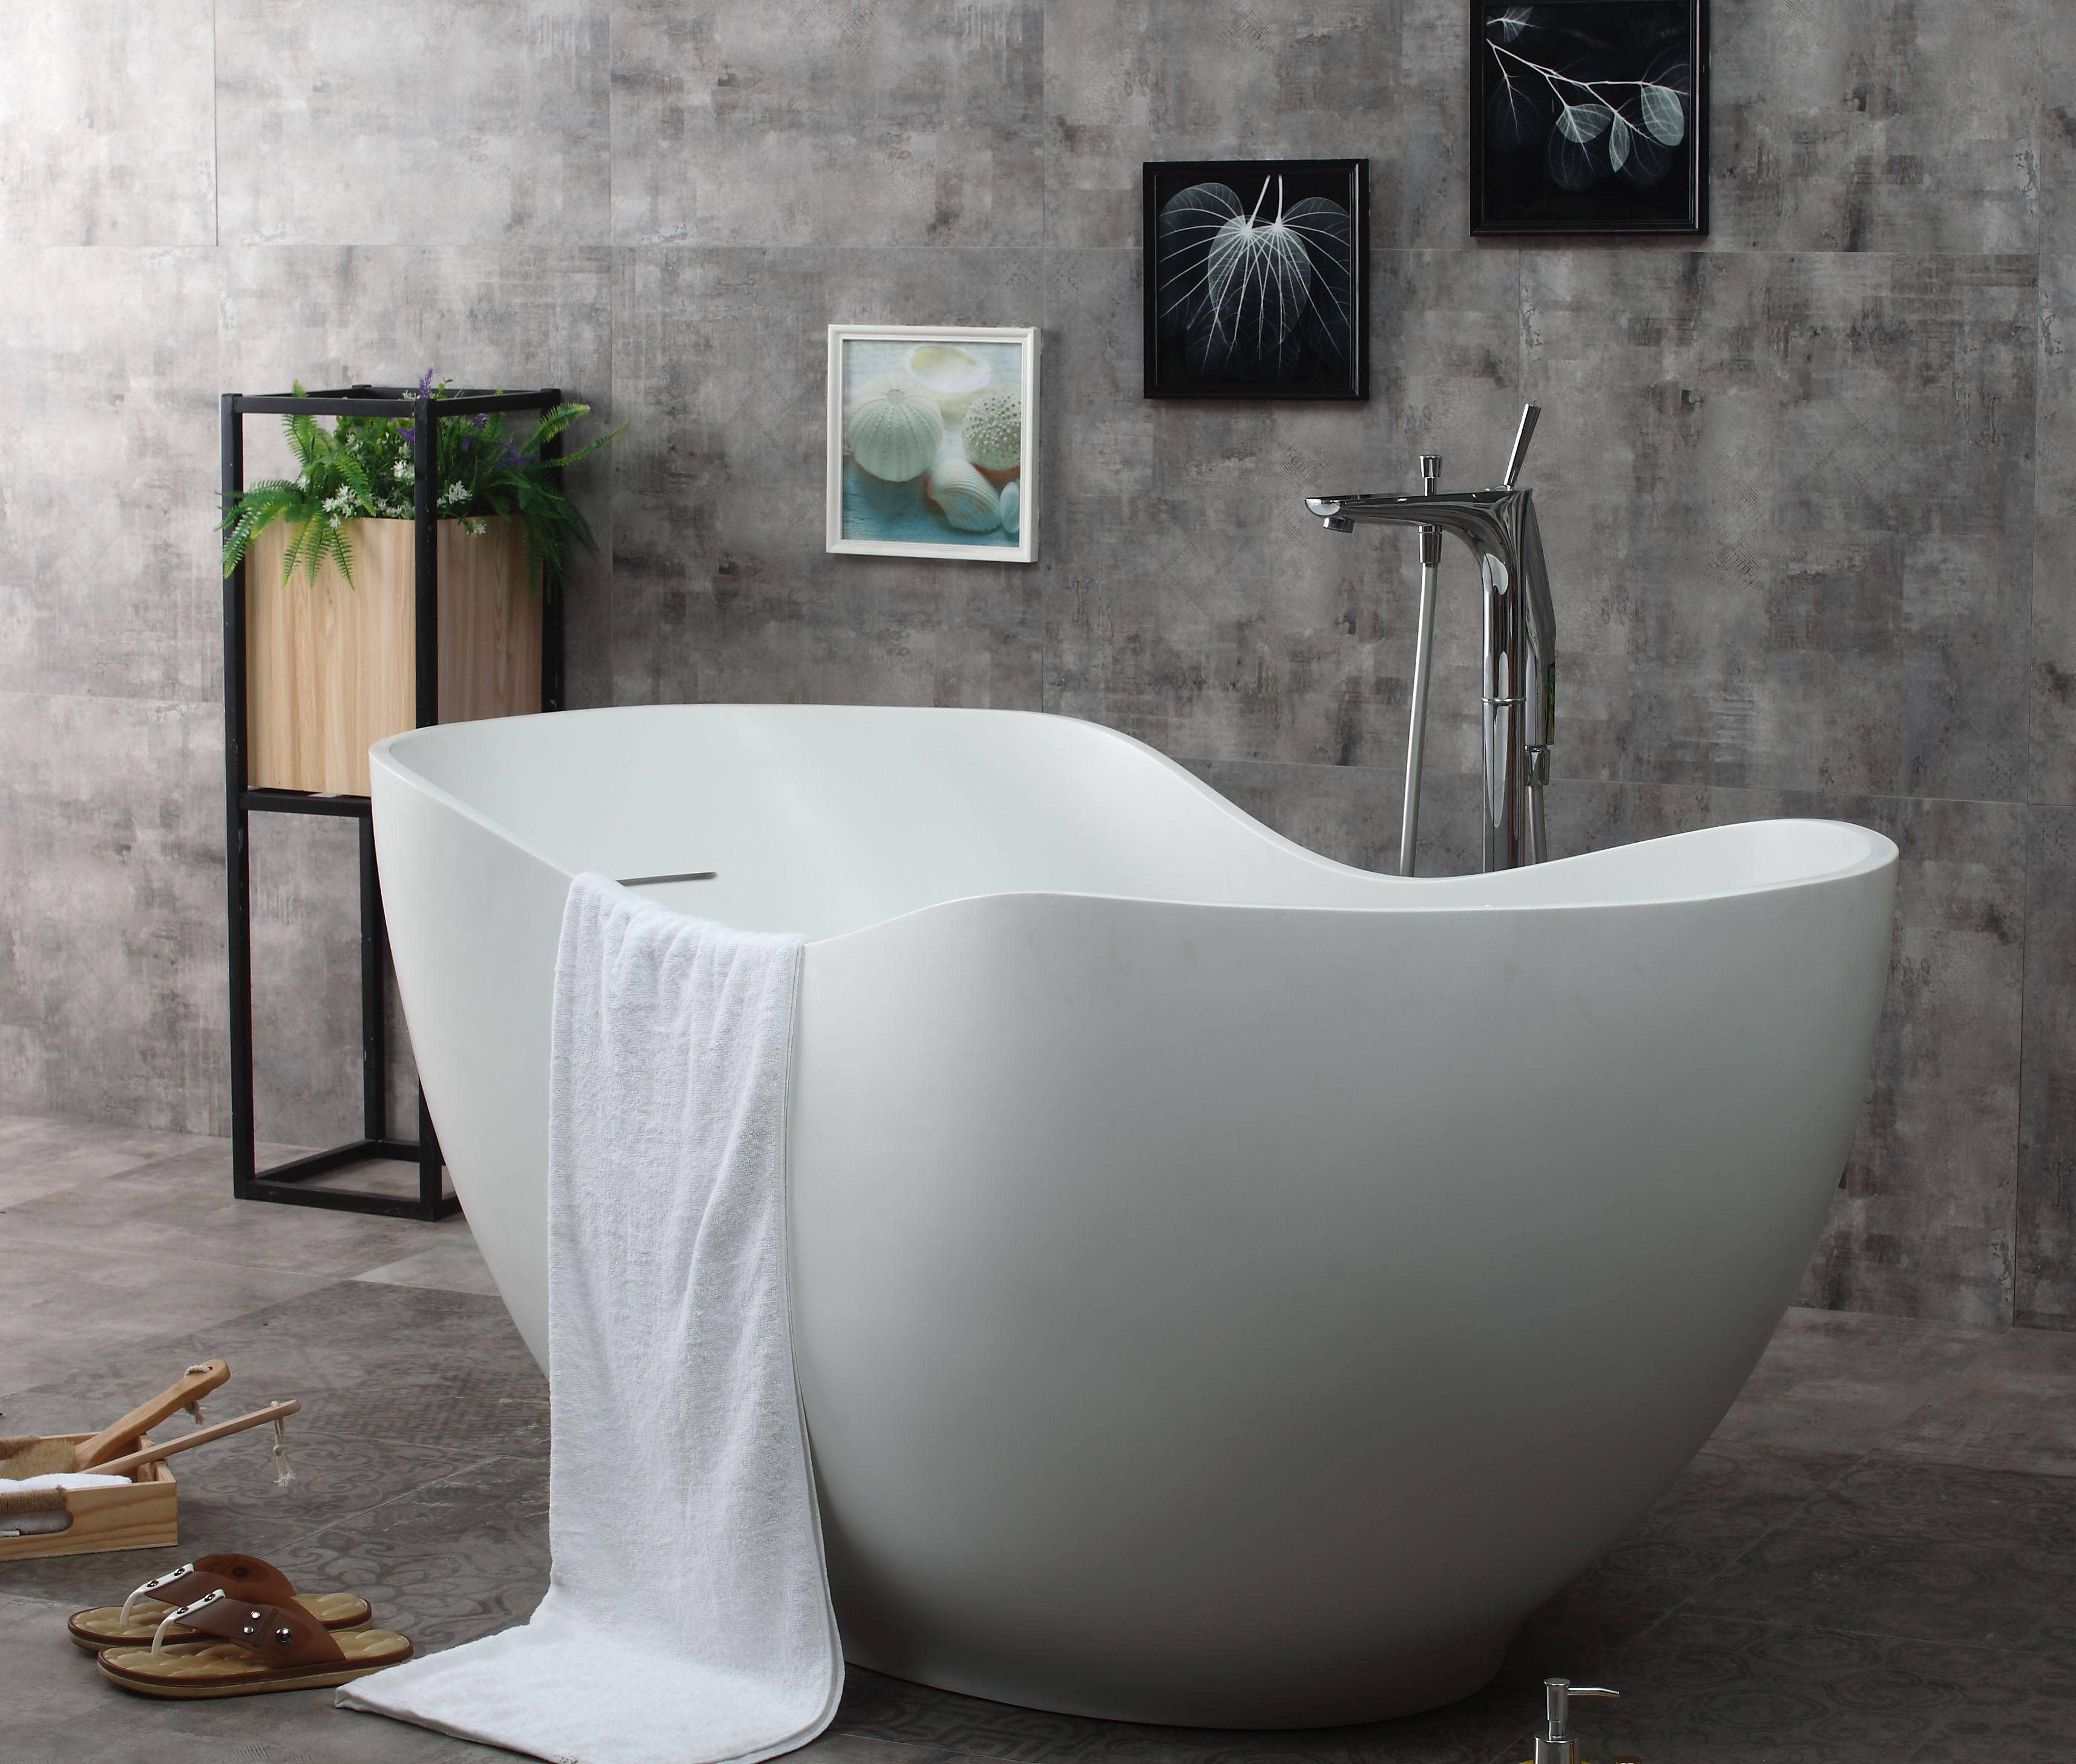 Bathtub Corian 06 66x 31 Bouticcelli